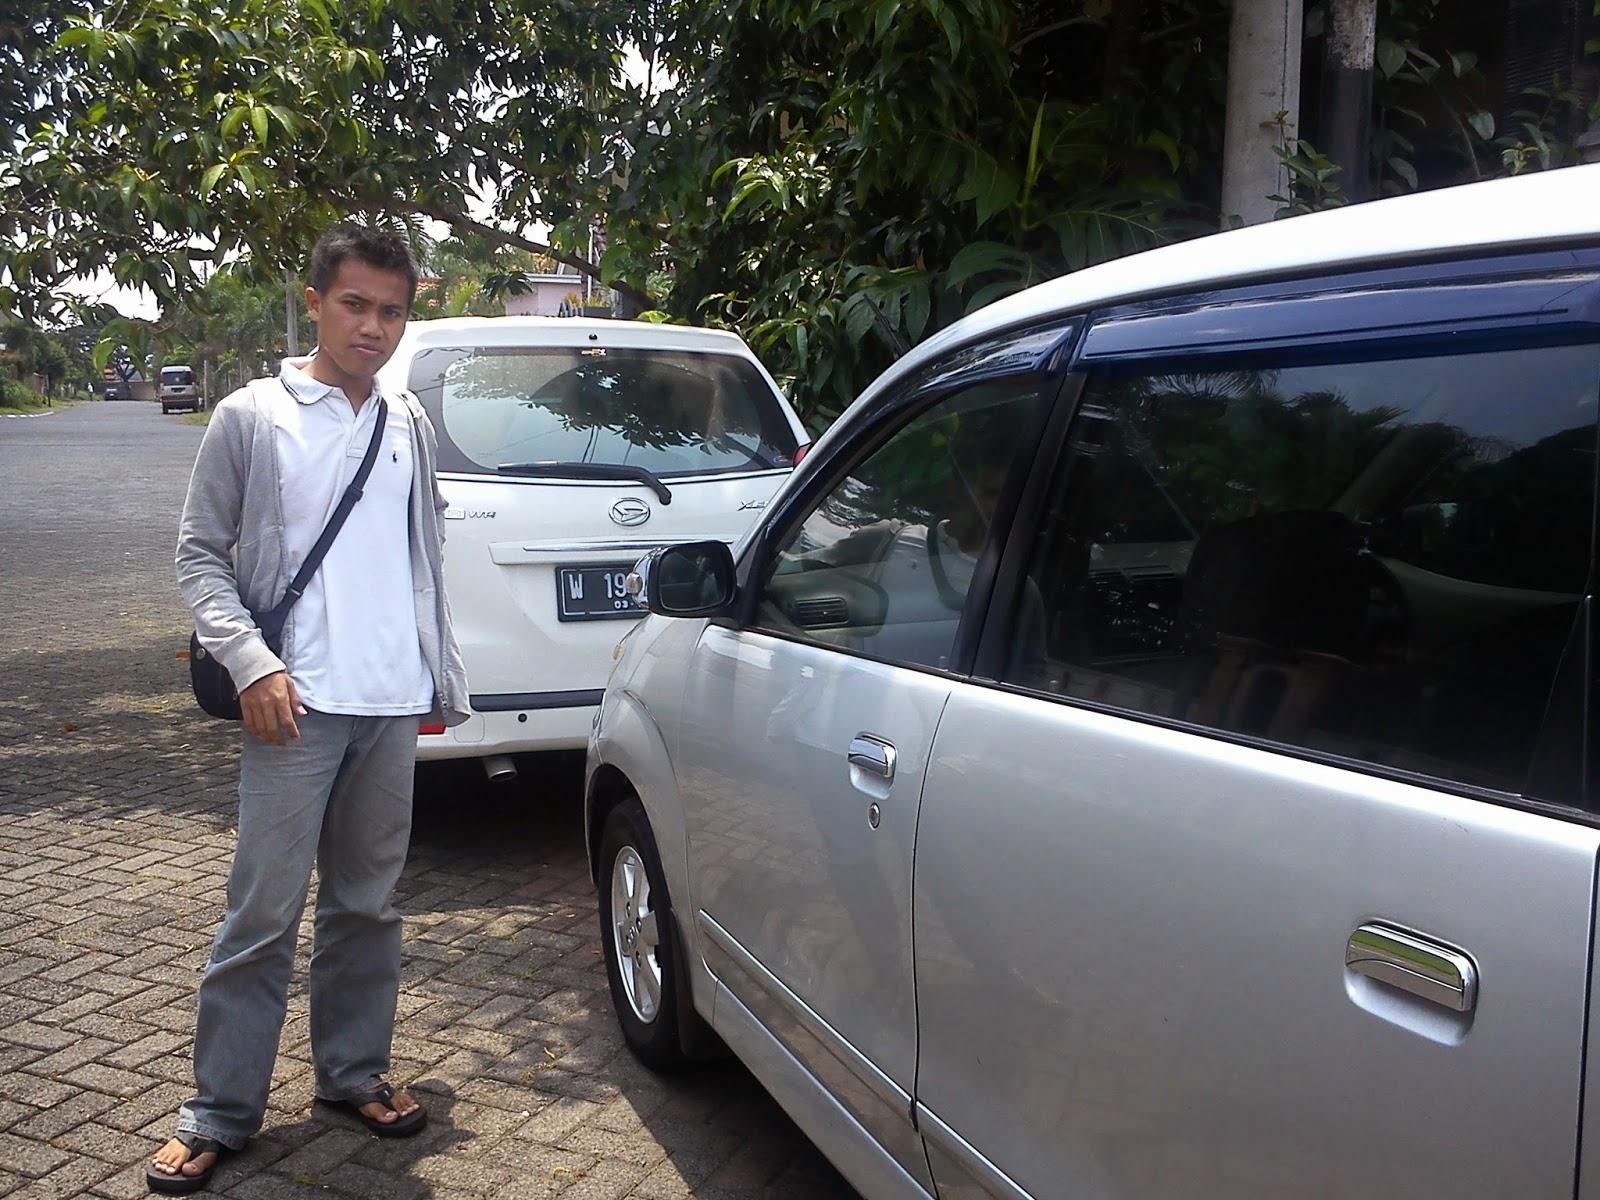 Carter Drop Mobil Juanda Batu - Drop Malang Juanda